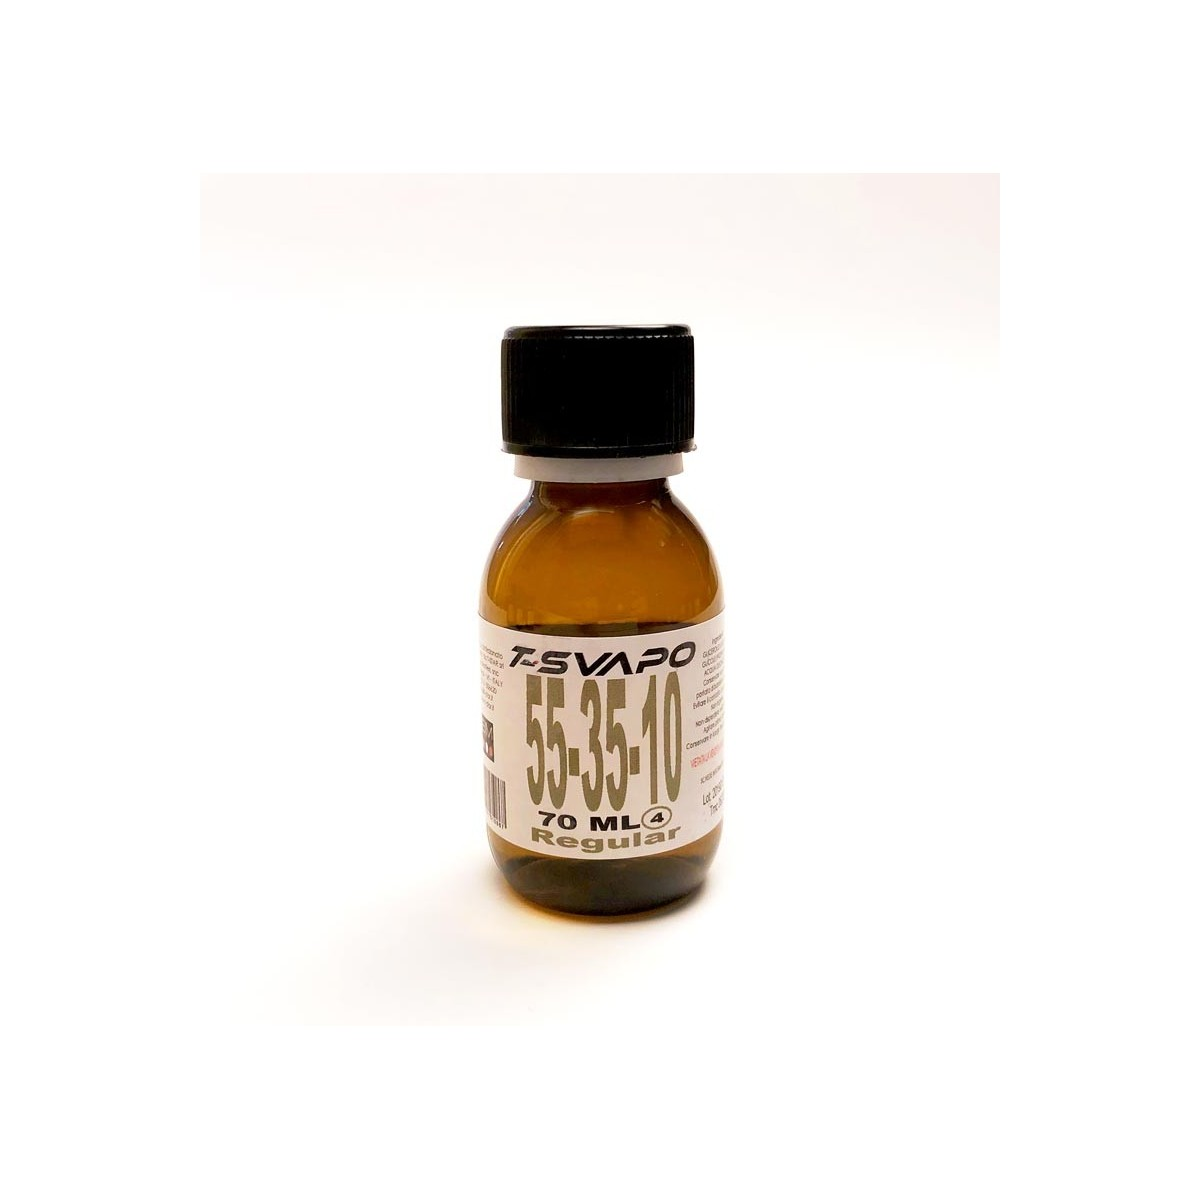 Base Neutra 70ml Senza Nicotina T-Svapo  - Normale